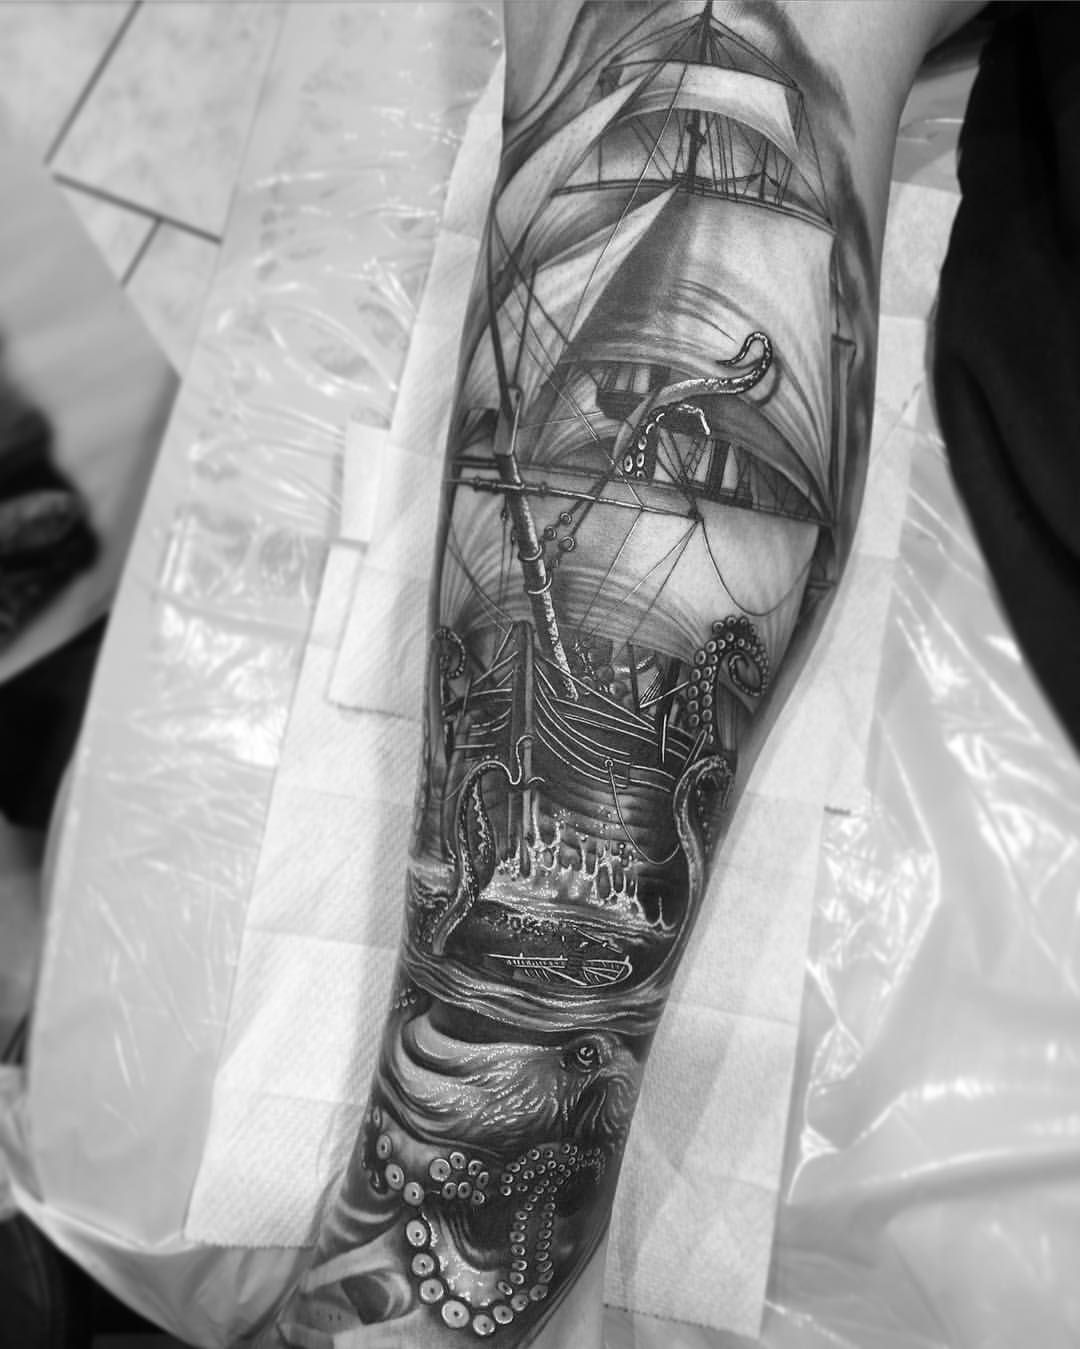 Nautical Tattoo Poseidon And Ship: Pin By Scott Boyd On Tattoos